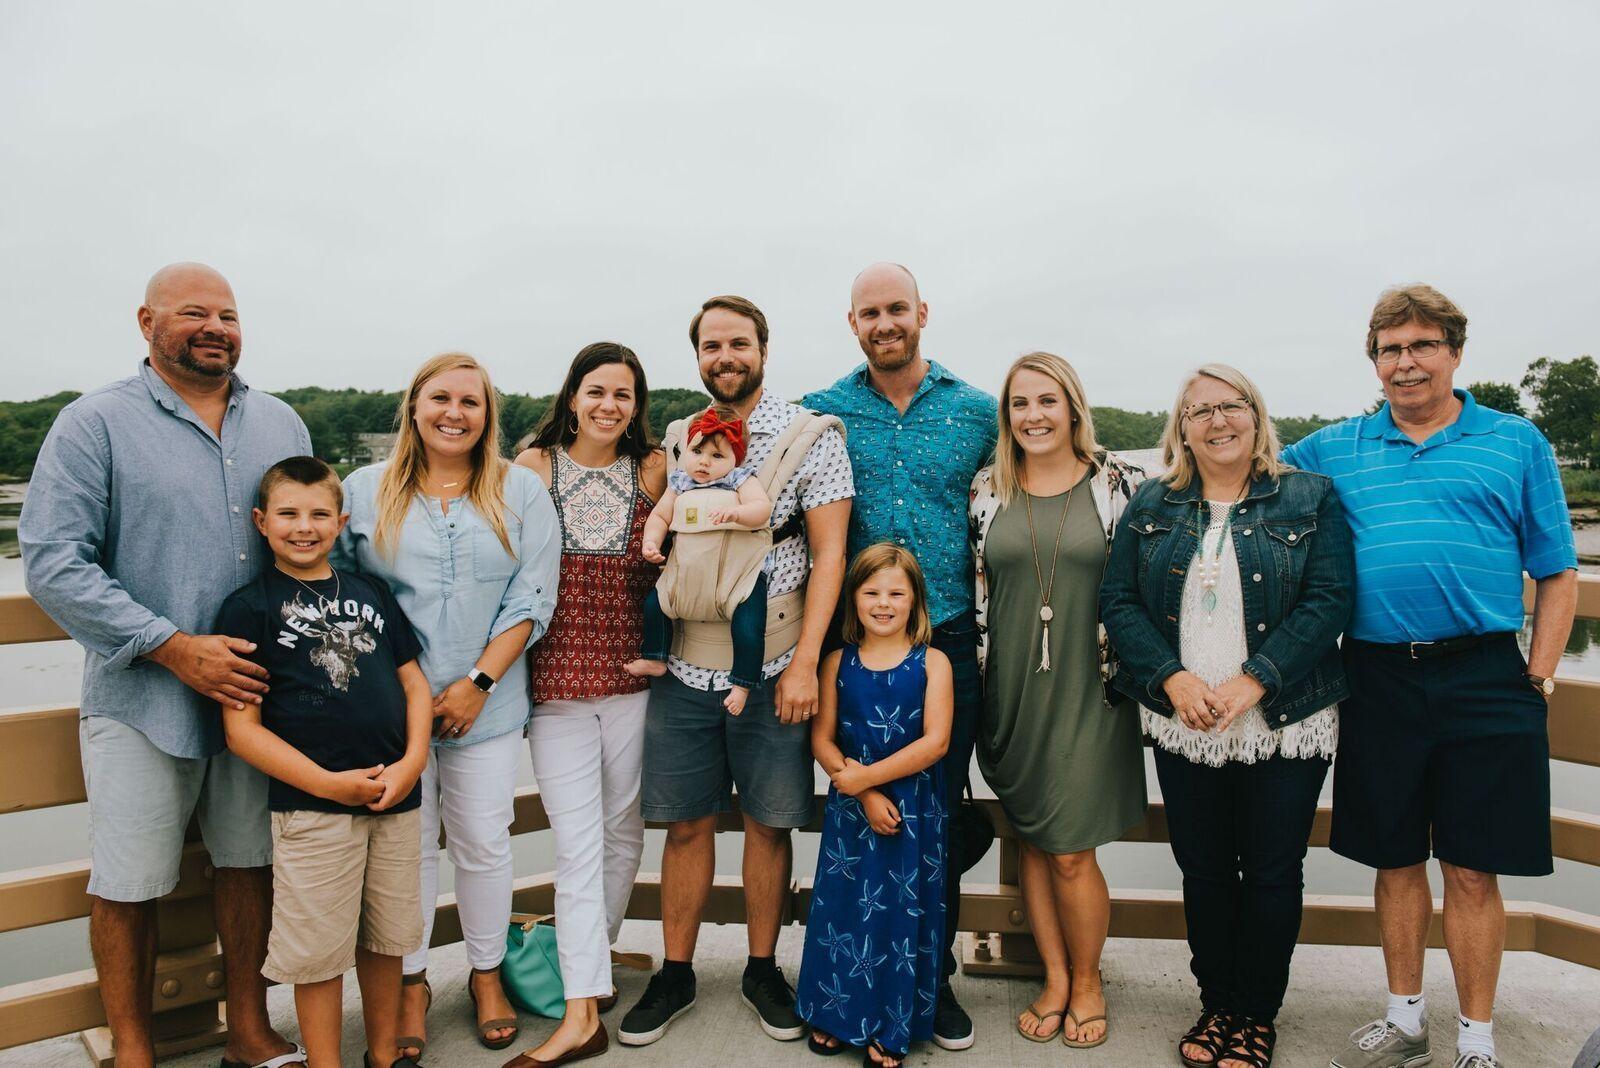 Mrs. Trauner's family